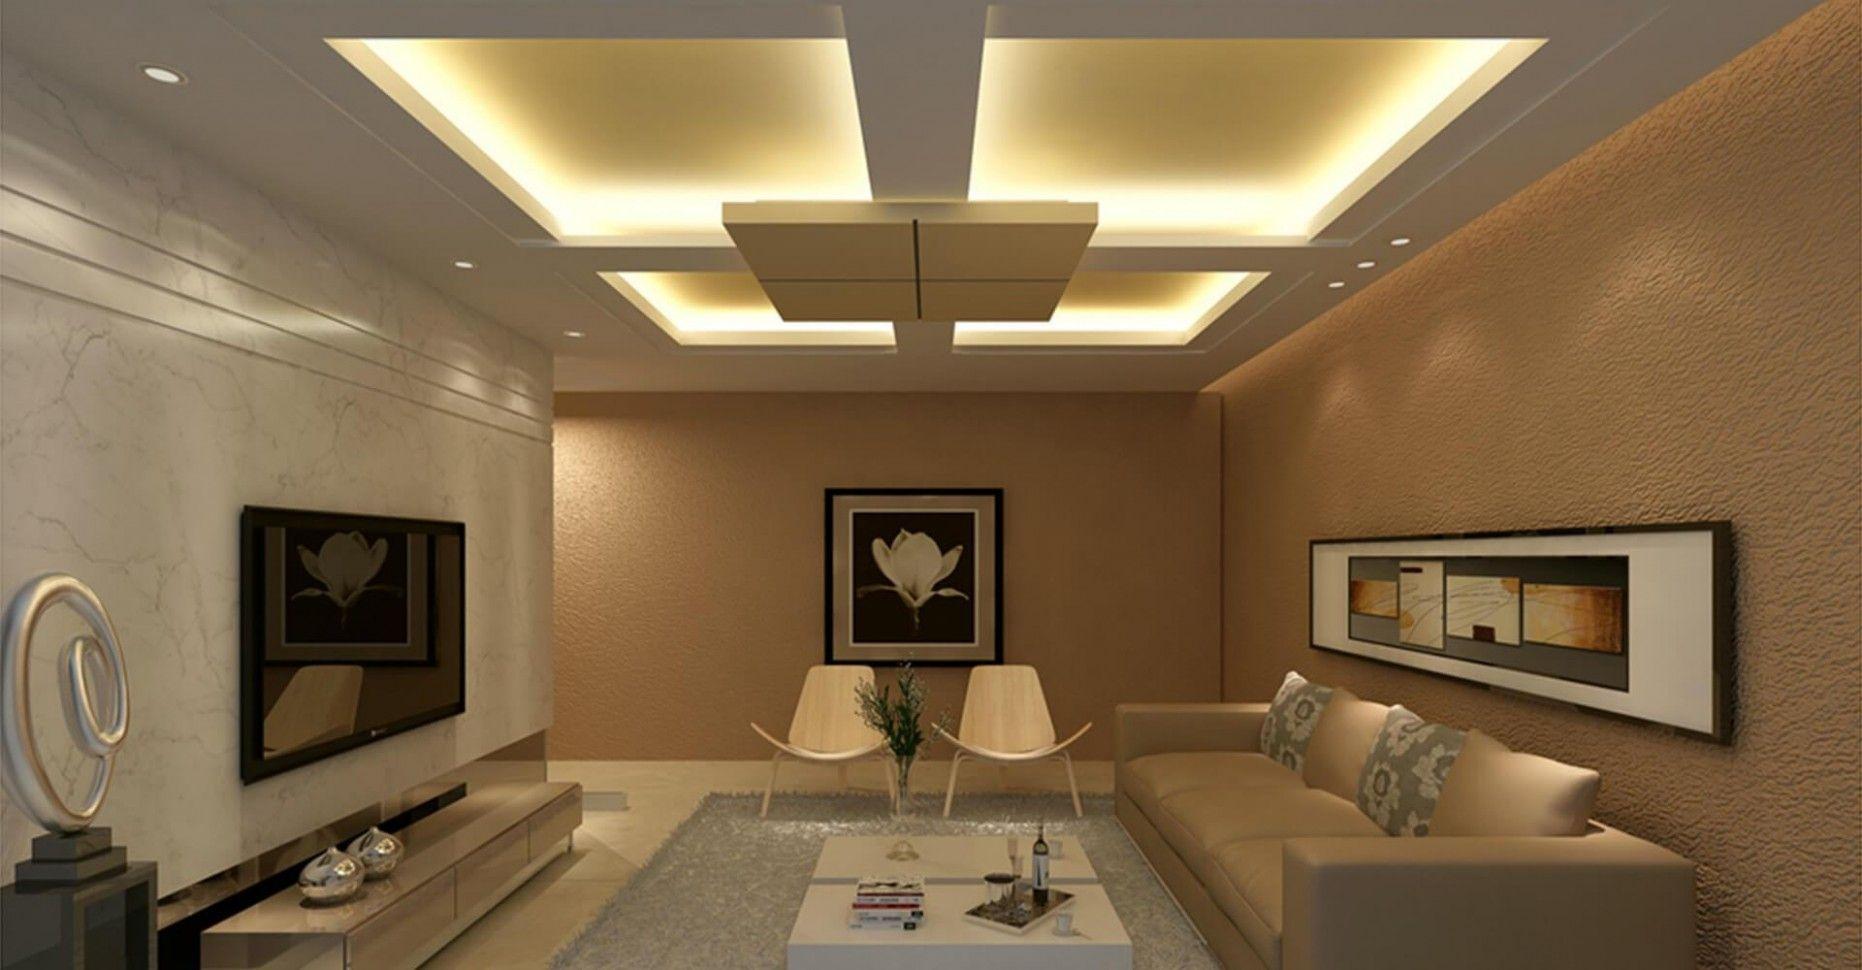 Modern Gypsum Board Design For Living Room Pop Ceiling Design Ceiling Design Living Room Bedroom False Ceiling Design